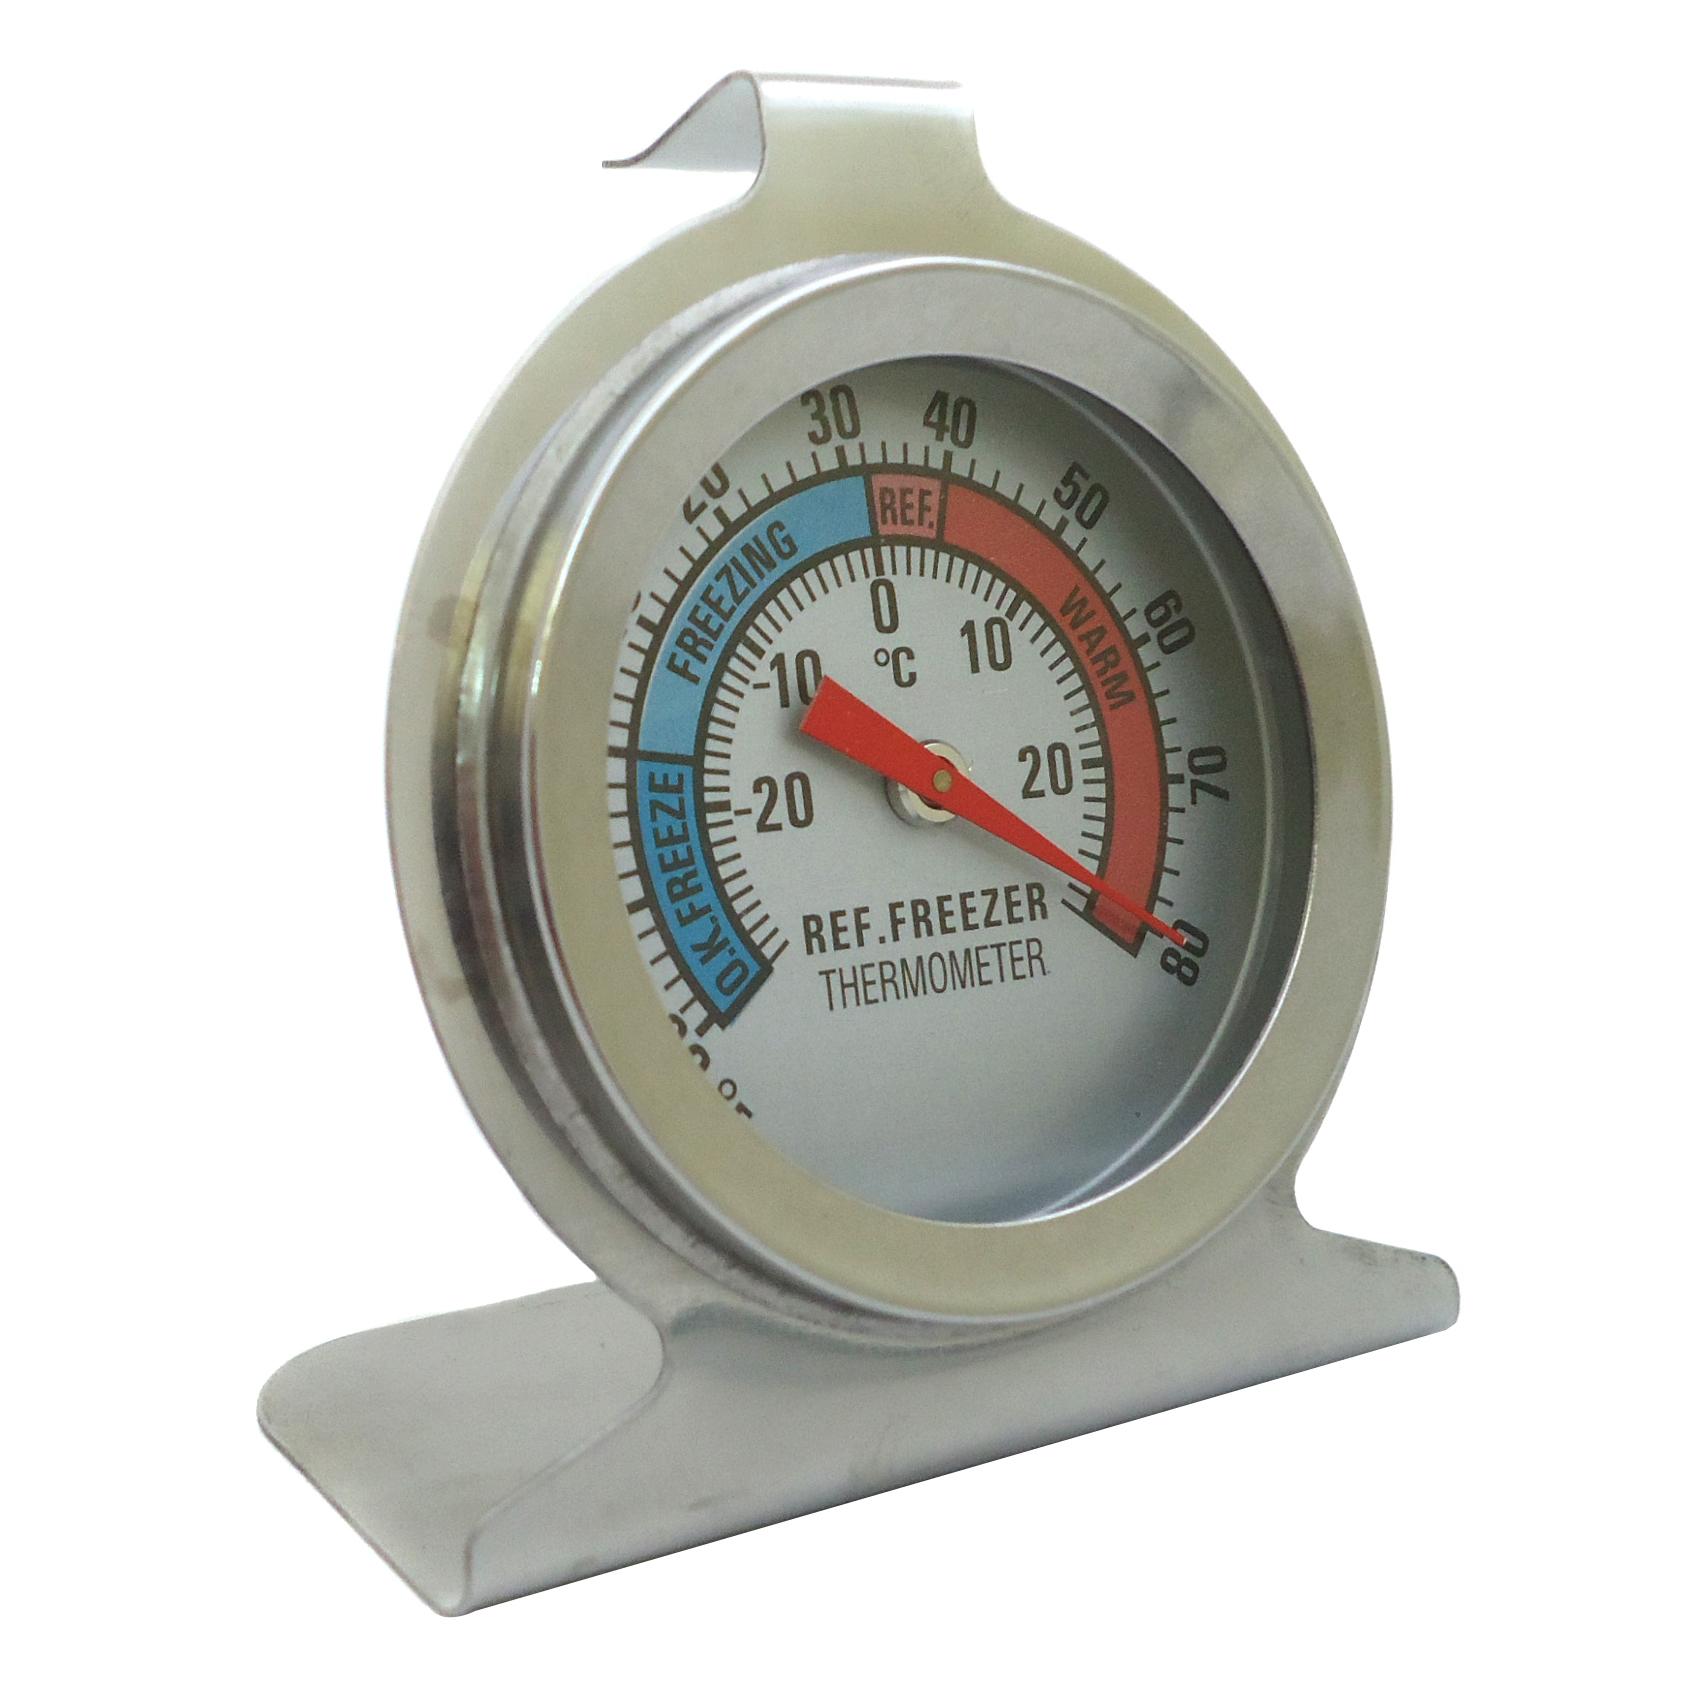 LACOR 62450 Θερμόμετρα Ψυγείου με Βάση (Βαθμοί κελσίου: -30/+30) εργαλεία για ψυκτικούς   θερμόμετρα   υγρασιόμετρα  εργαλεία για ψυκτικούς   θερ